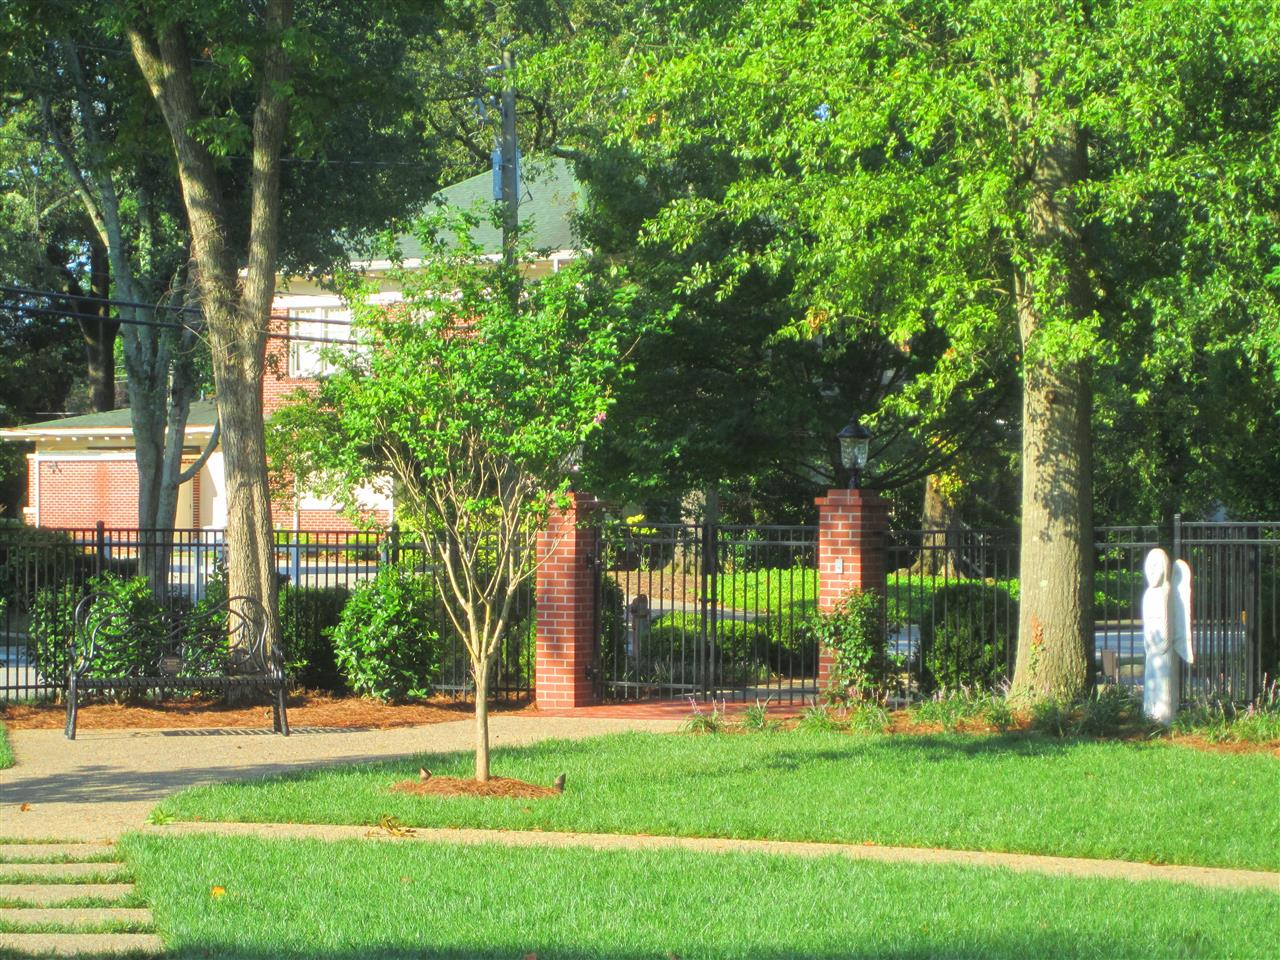 Entry Gate Jones Memorial Garden Candler Street Gainesville, Georgia